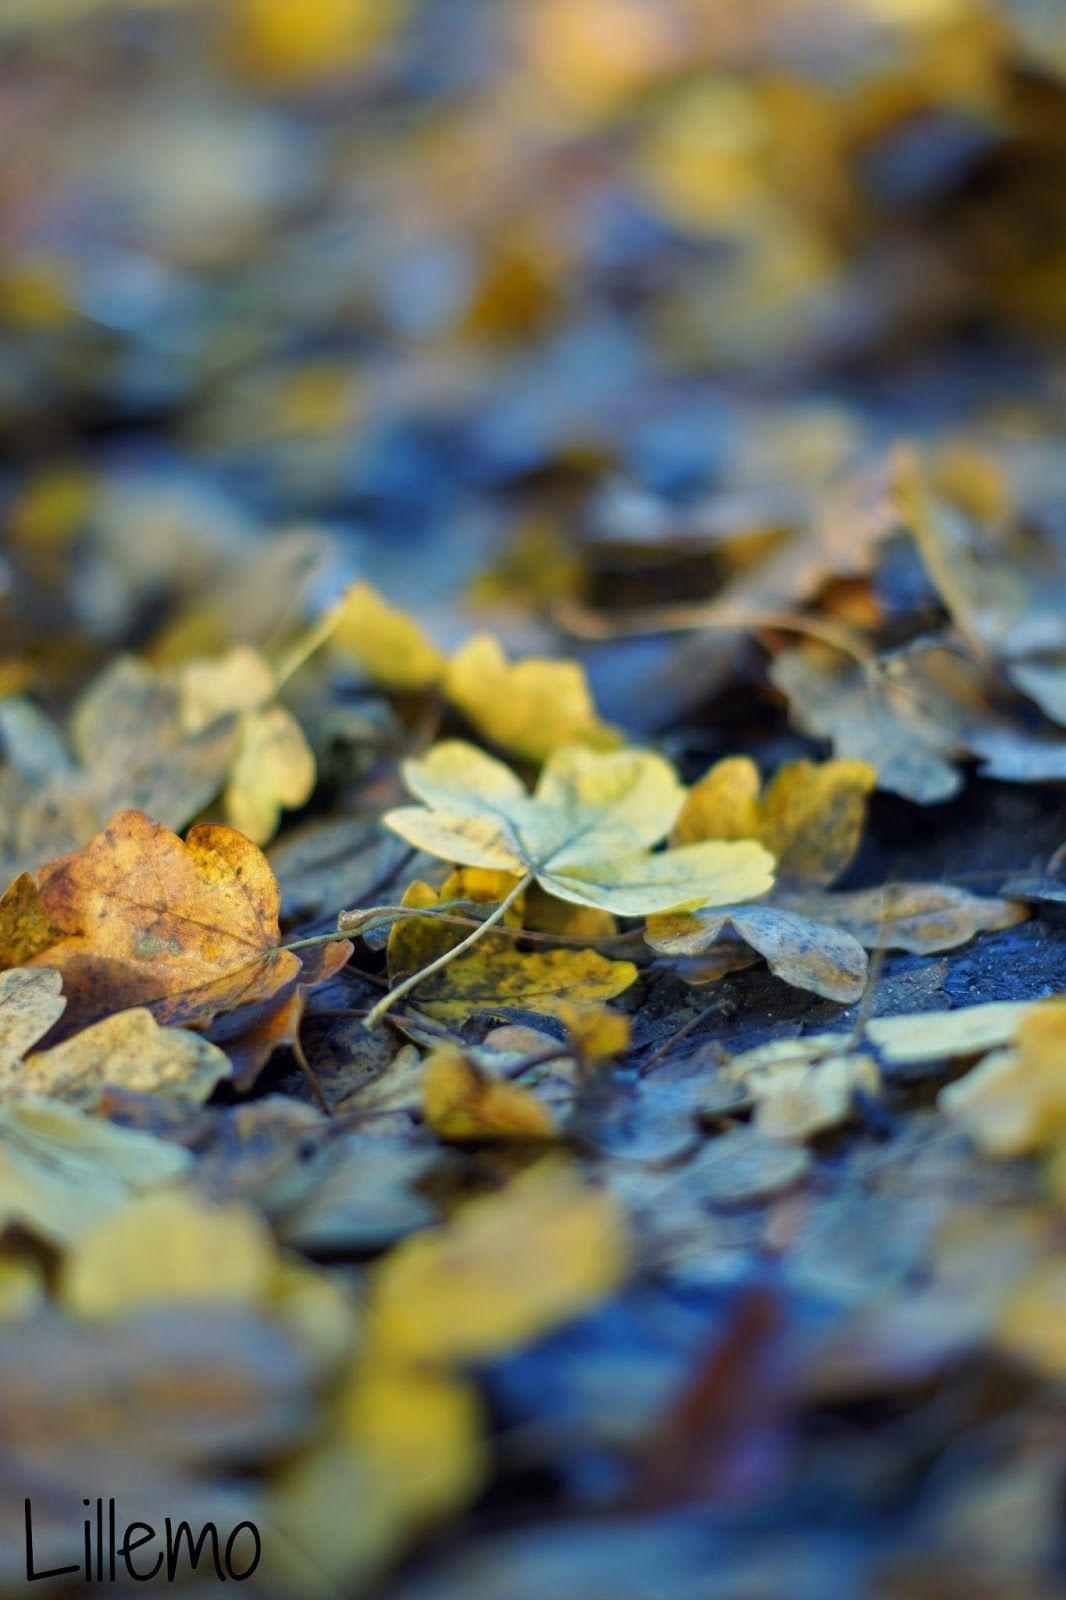 lillemo: der Herbst